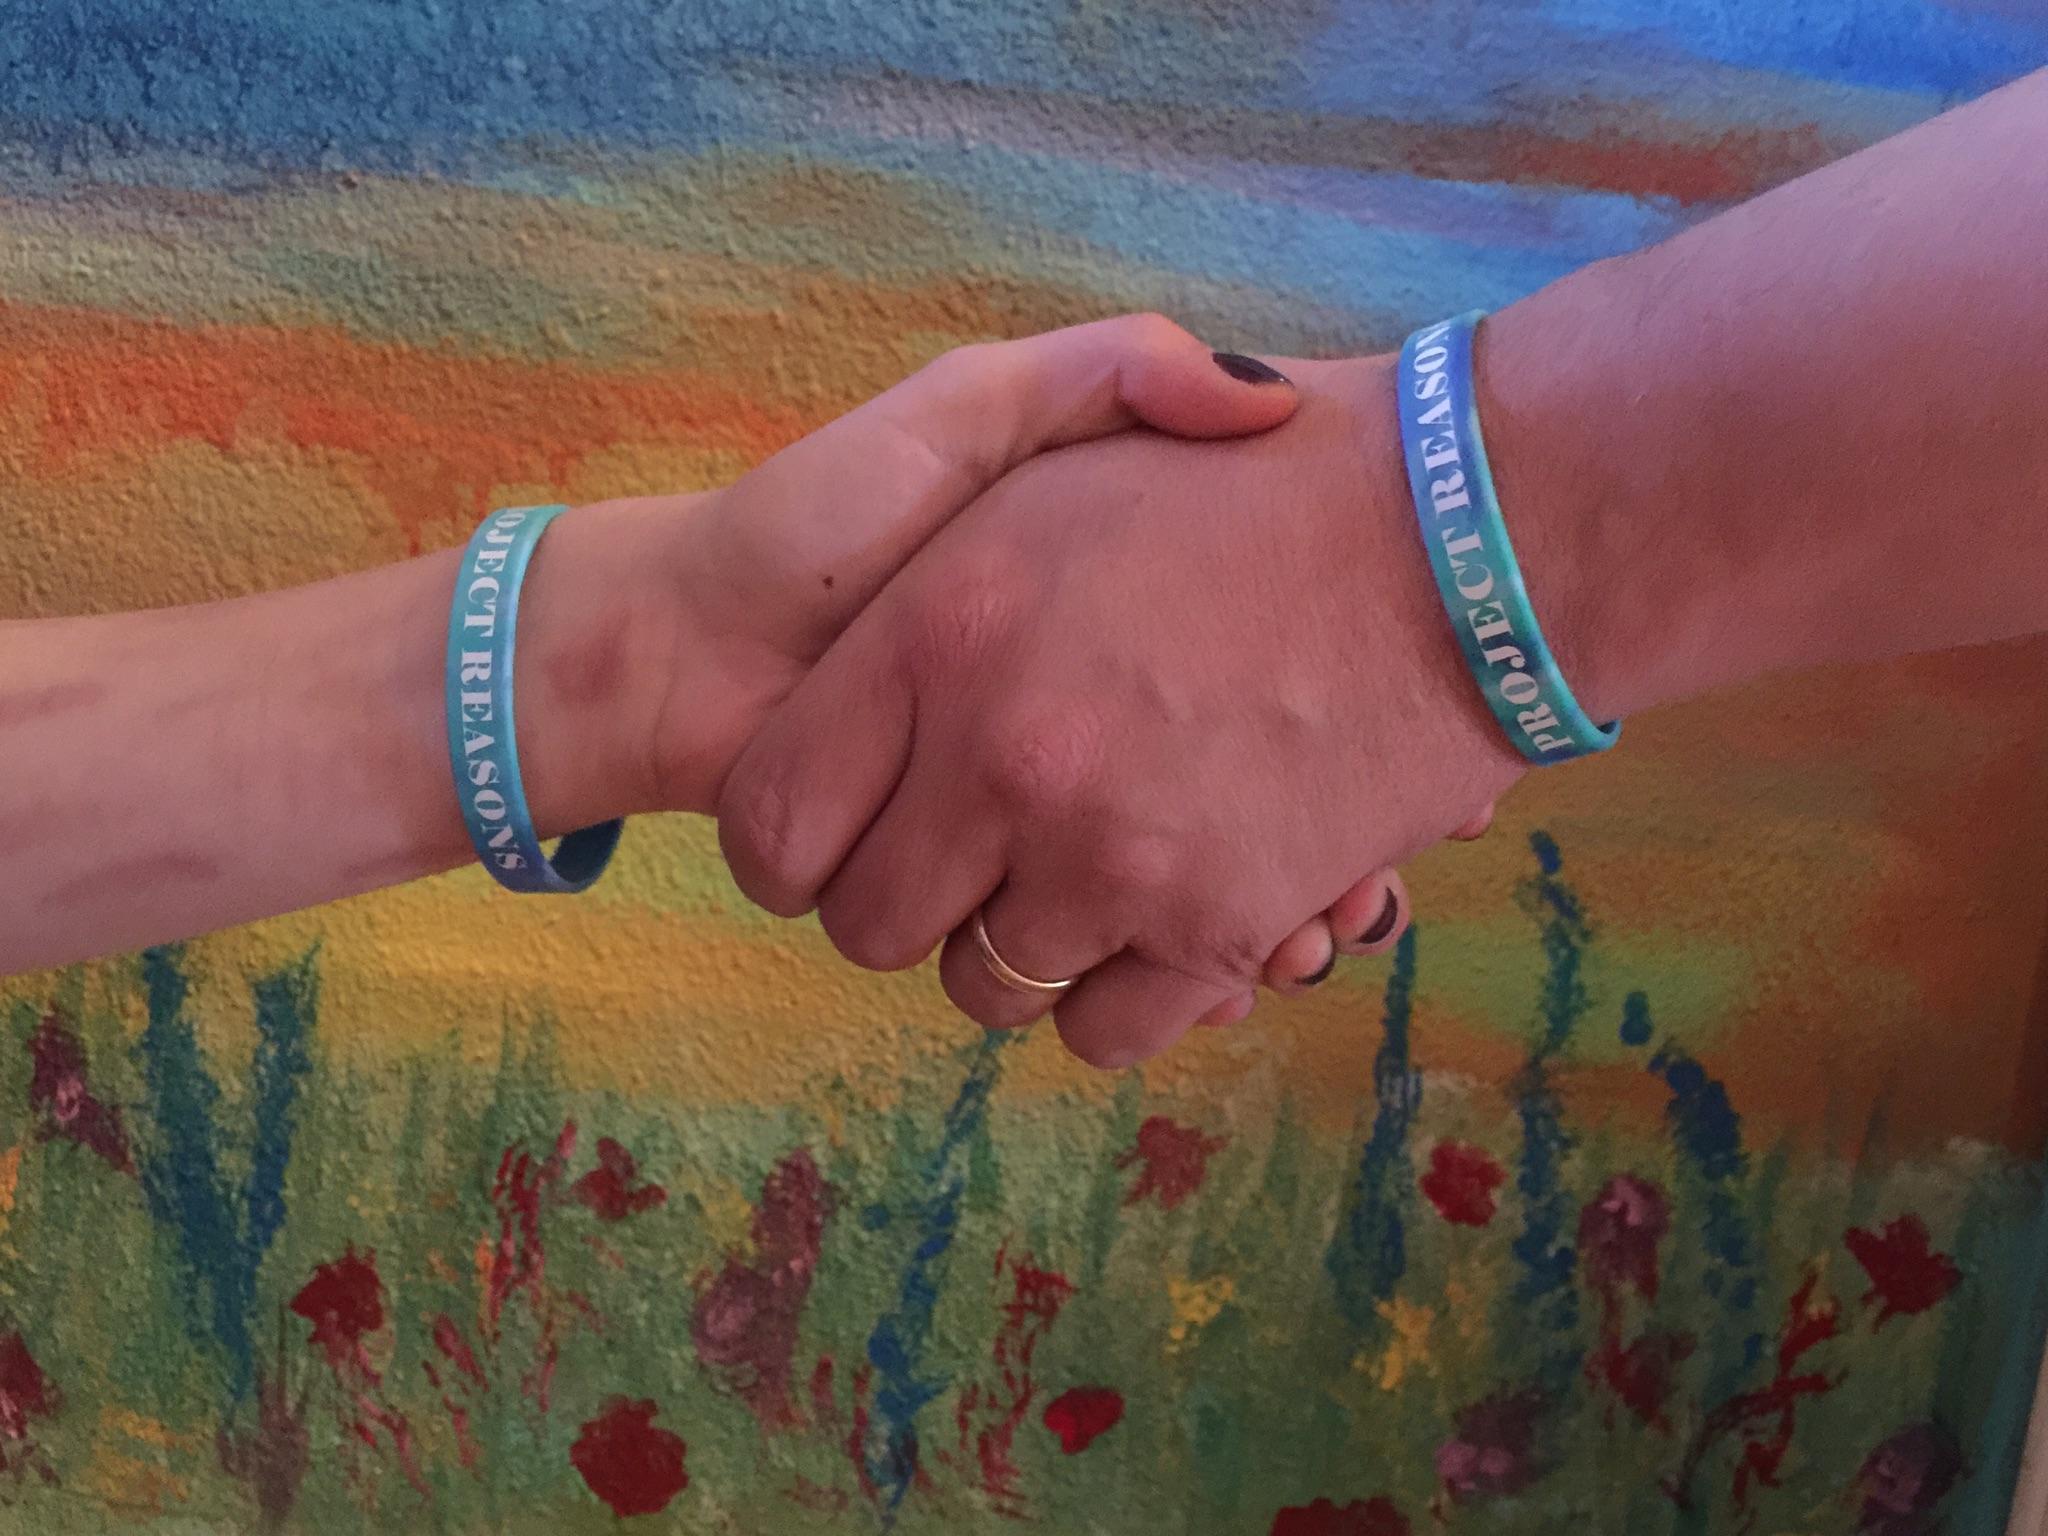 Pledge Bracelets